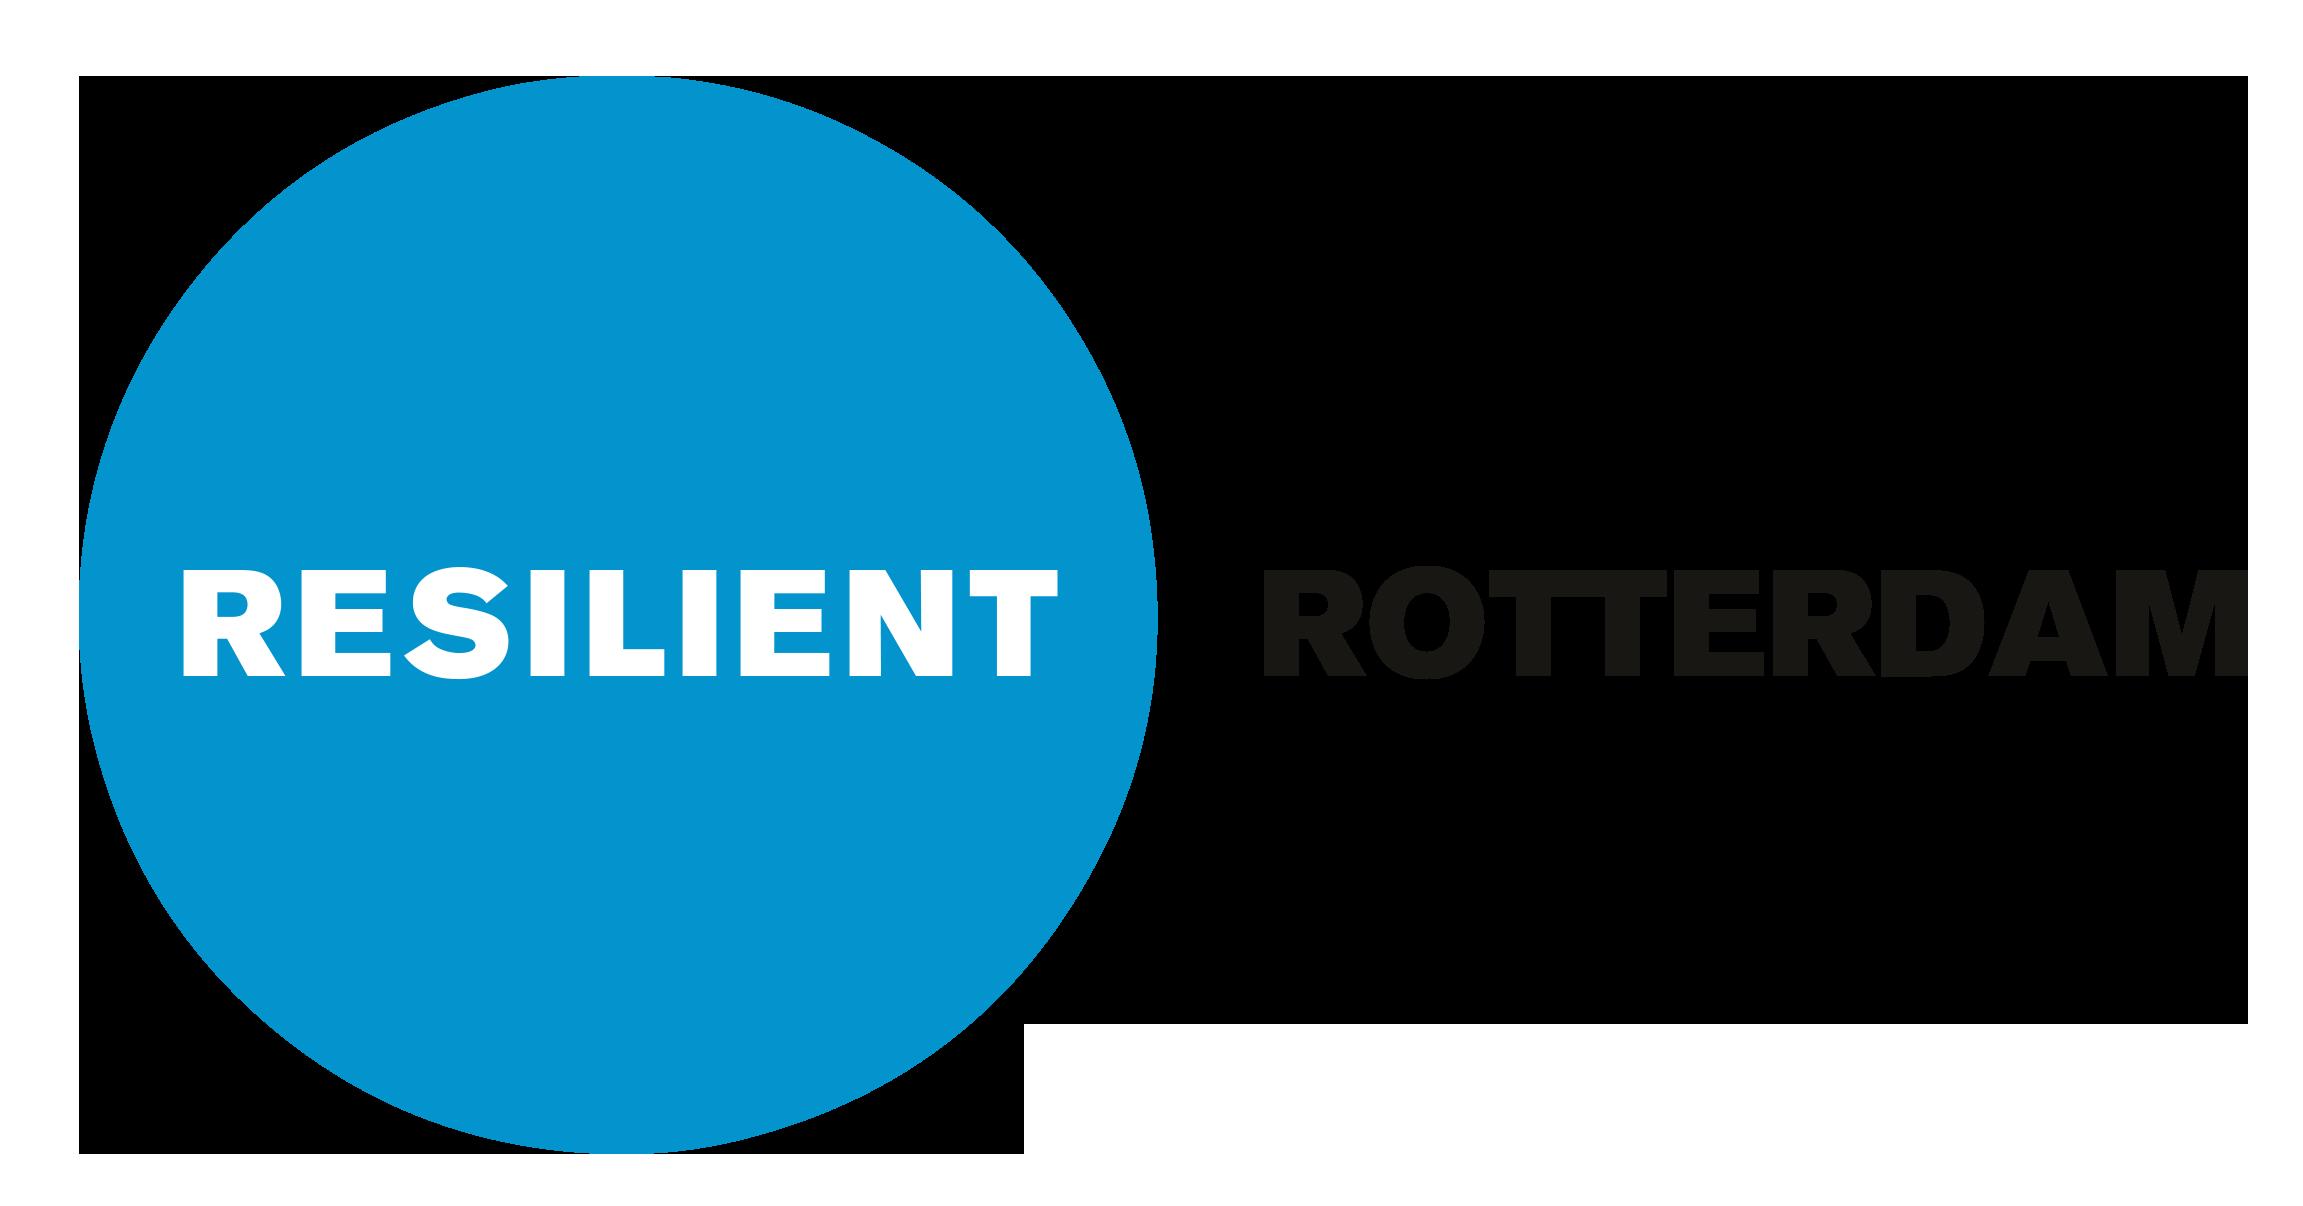 Rotterdam Resilient RCN